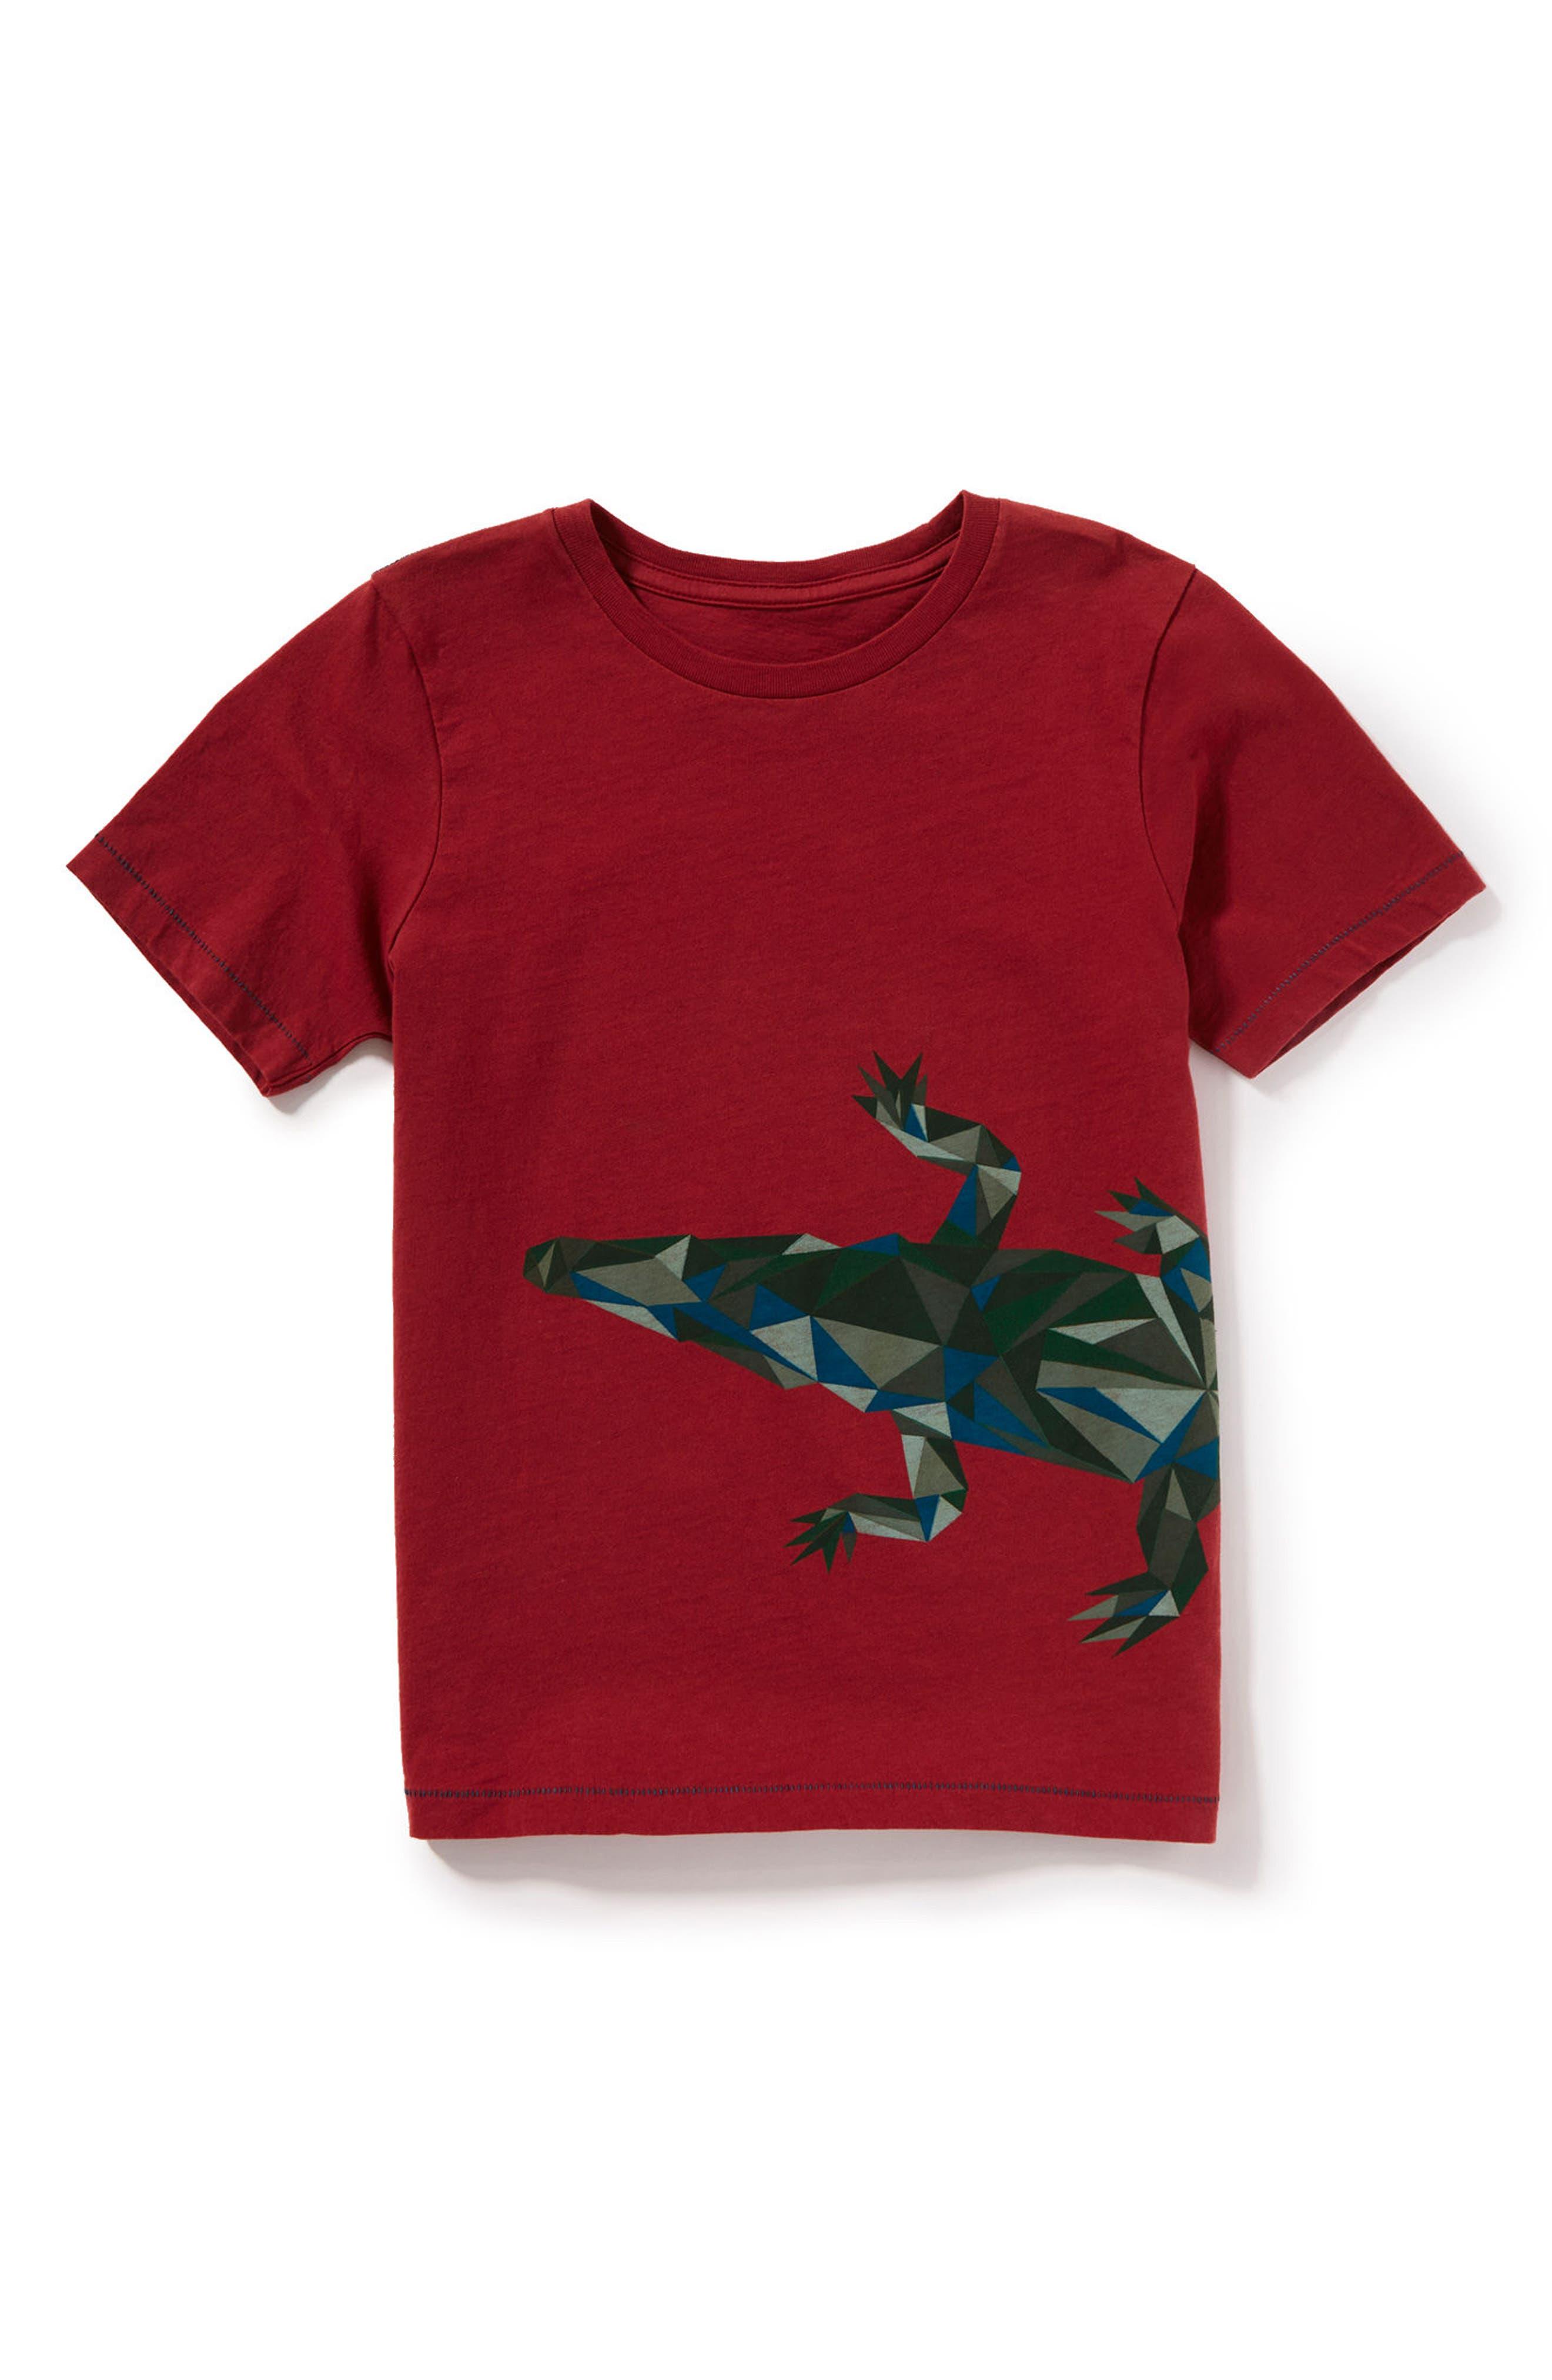 Peek Crocodile Graphic T-Shirt (Toddler Boys, Little Boys & Big Boys)